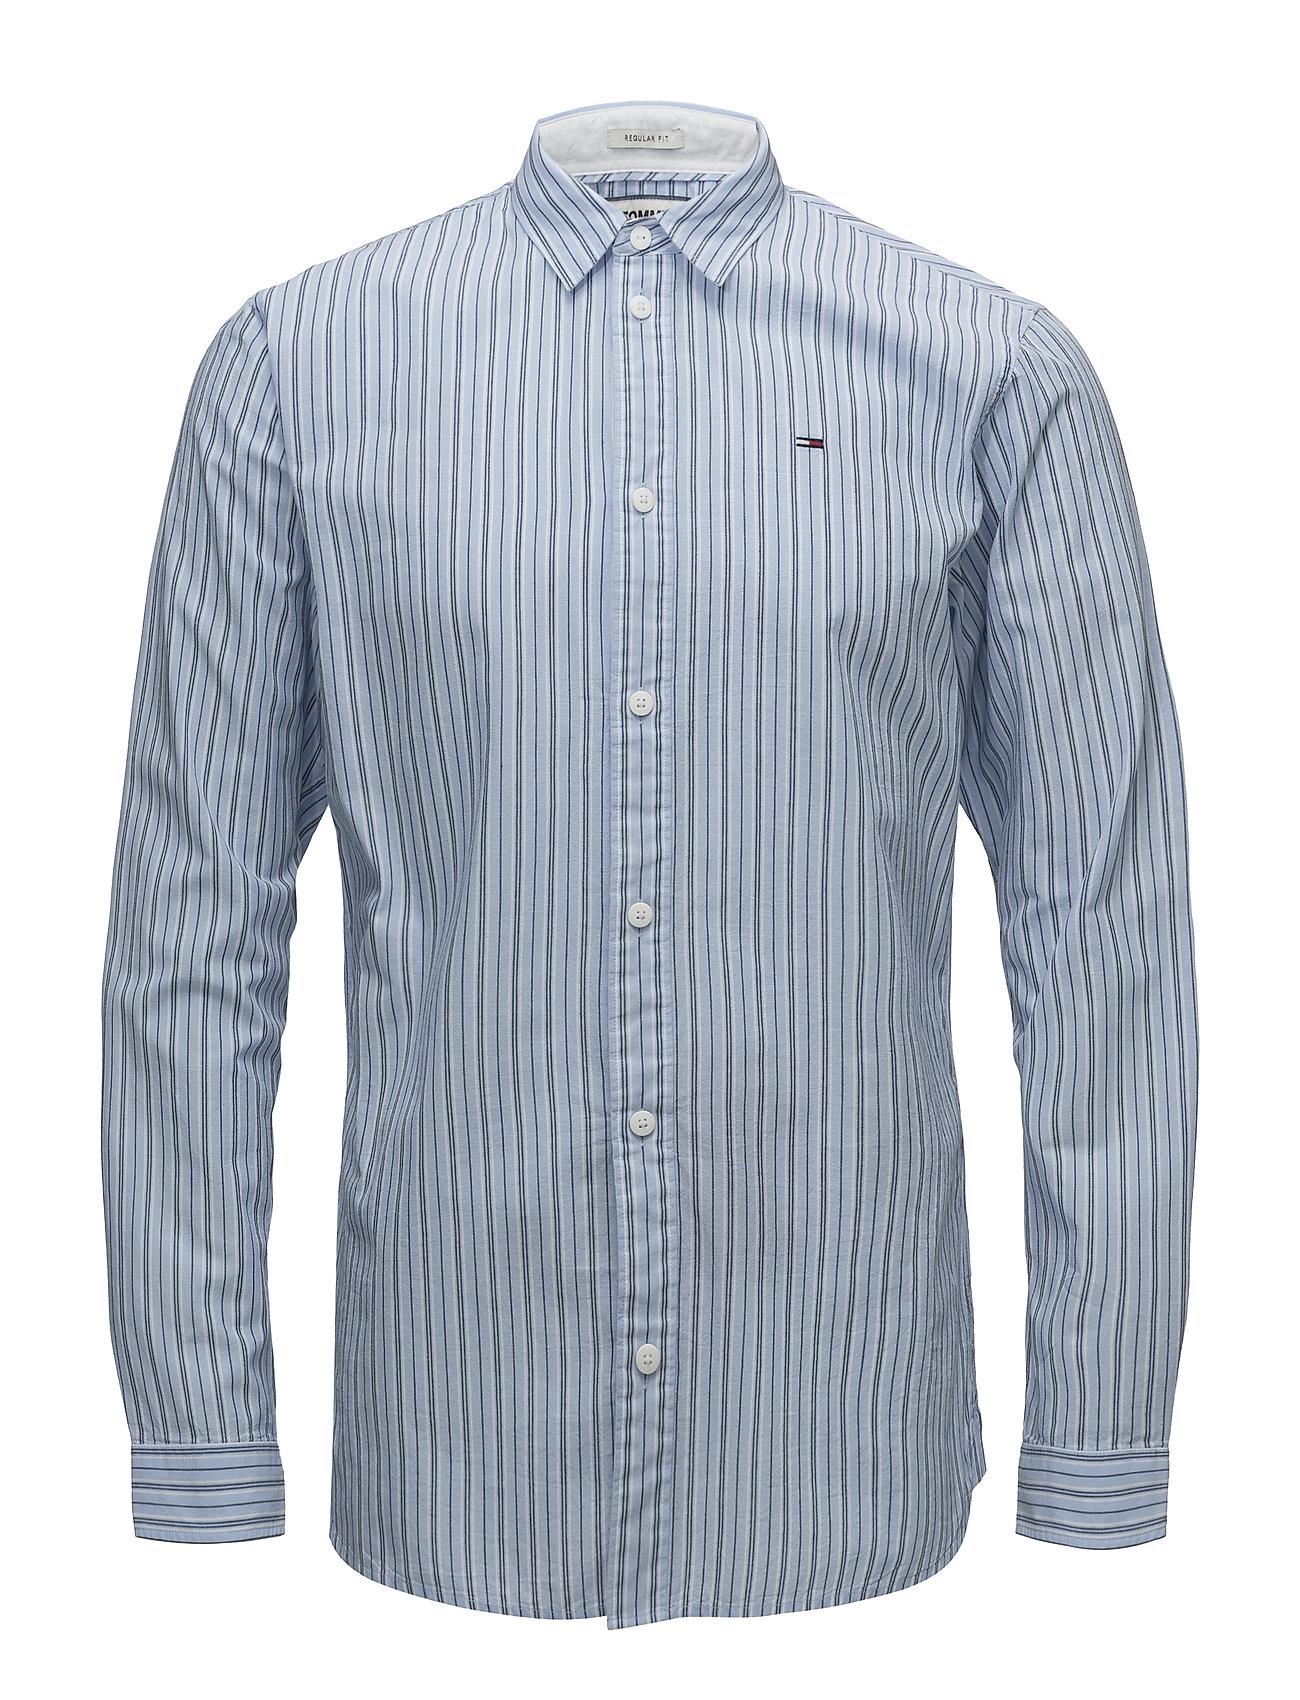 The Tjm WebMultiTommy Jeans Essential Stripe Shirtsurf ED9IHWY2